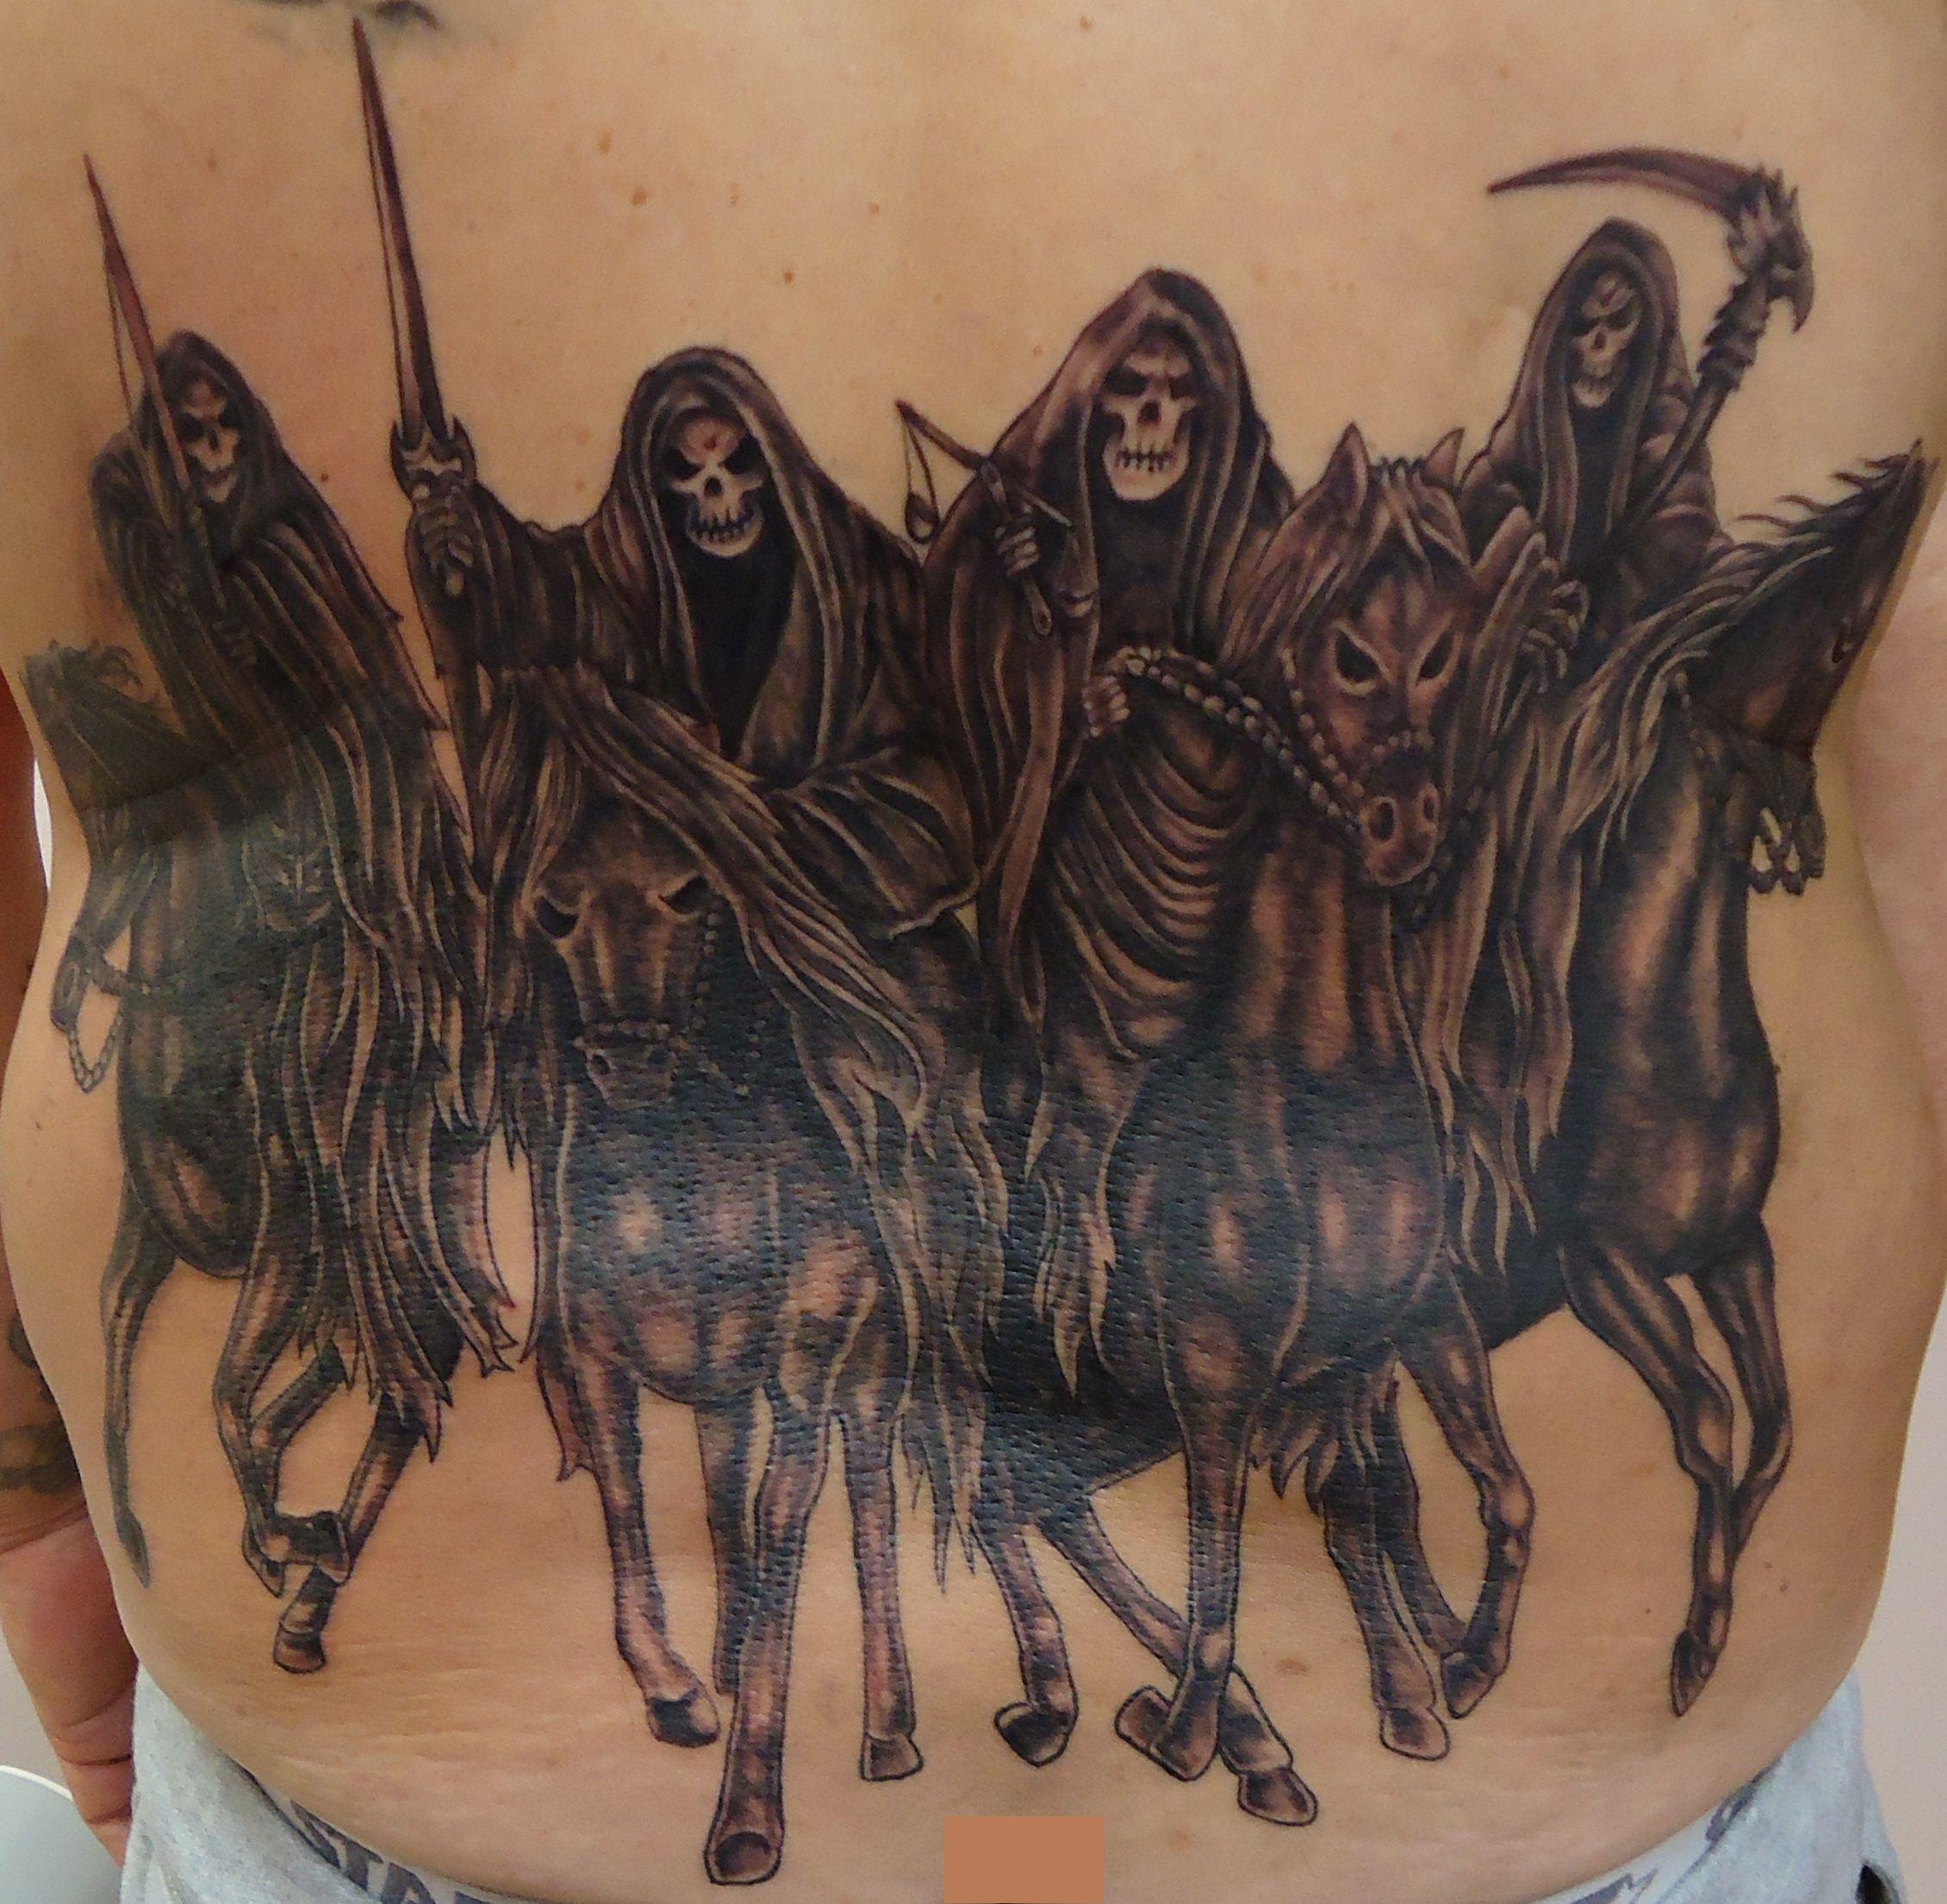 The Four Horsemen Of The Apocalypse Tattoo Google Search Tattoos Four Horsemen Of The Apocalypse Tattoo Apocalypse Tattoo